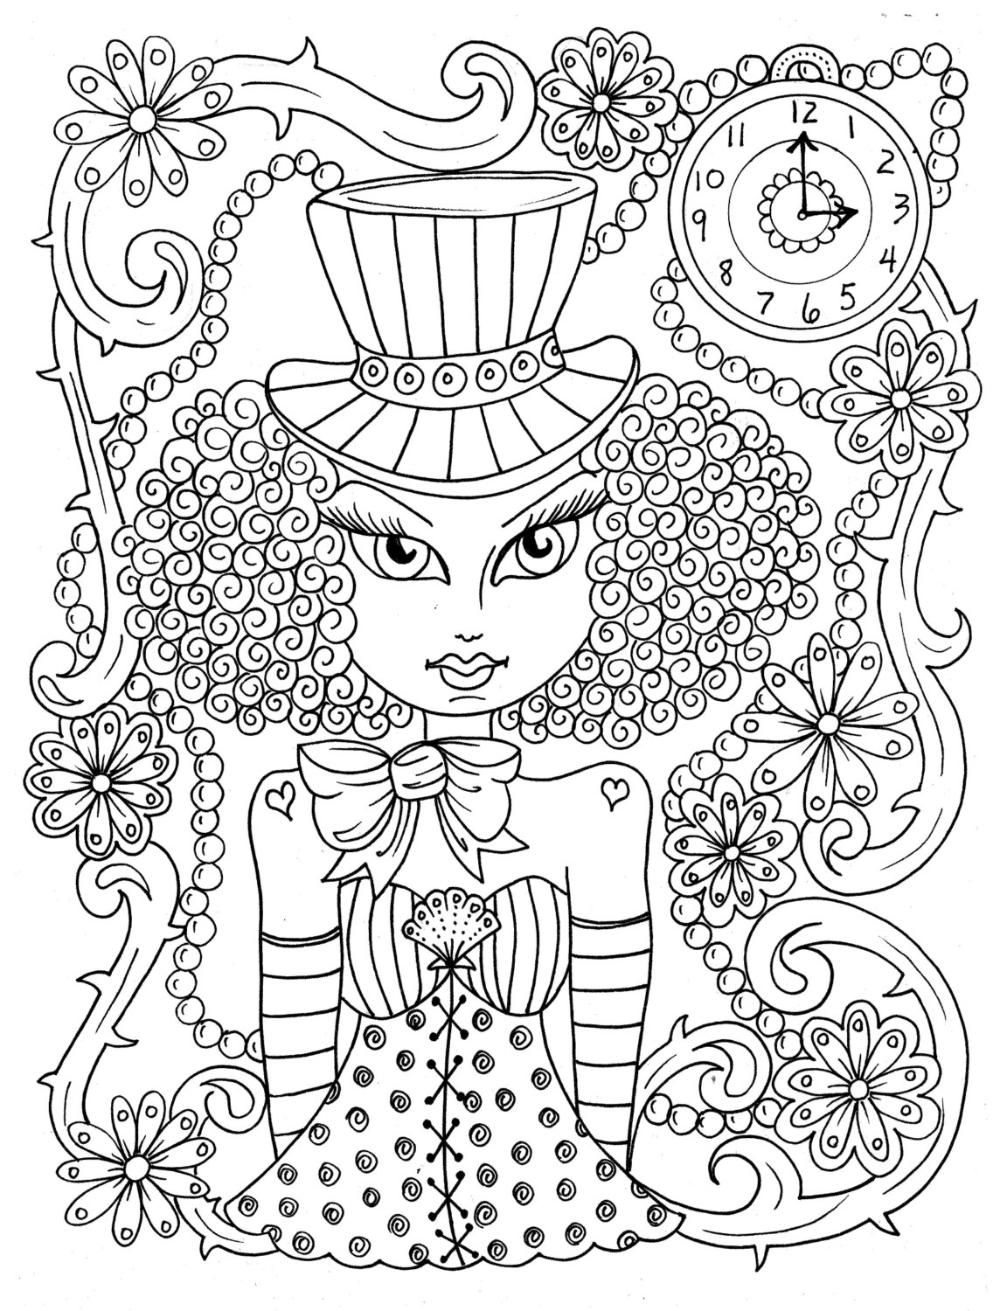 Steampunk Girls Coloring Book For All Ages Fun Quirky Cute Digi Stamps Digital Jpg Cardmaking Kleurboek Boek Bladzijden Kleuren Digi Stempels